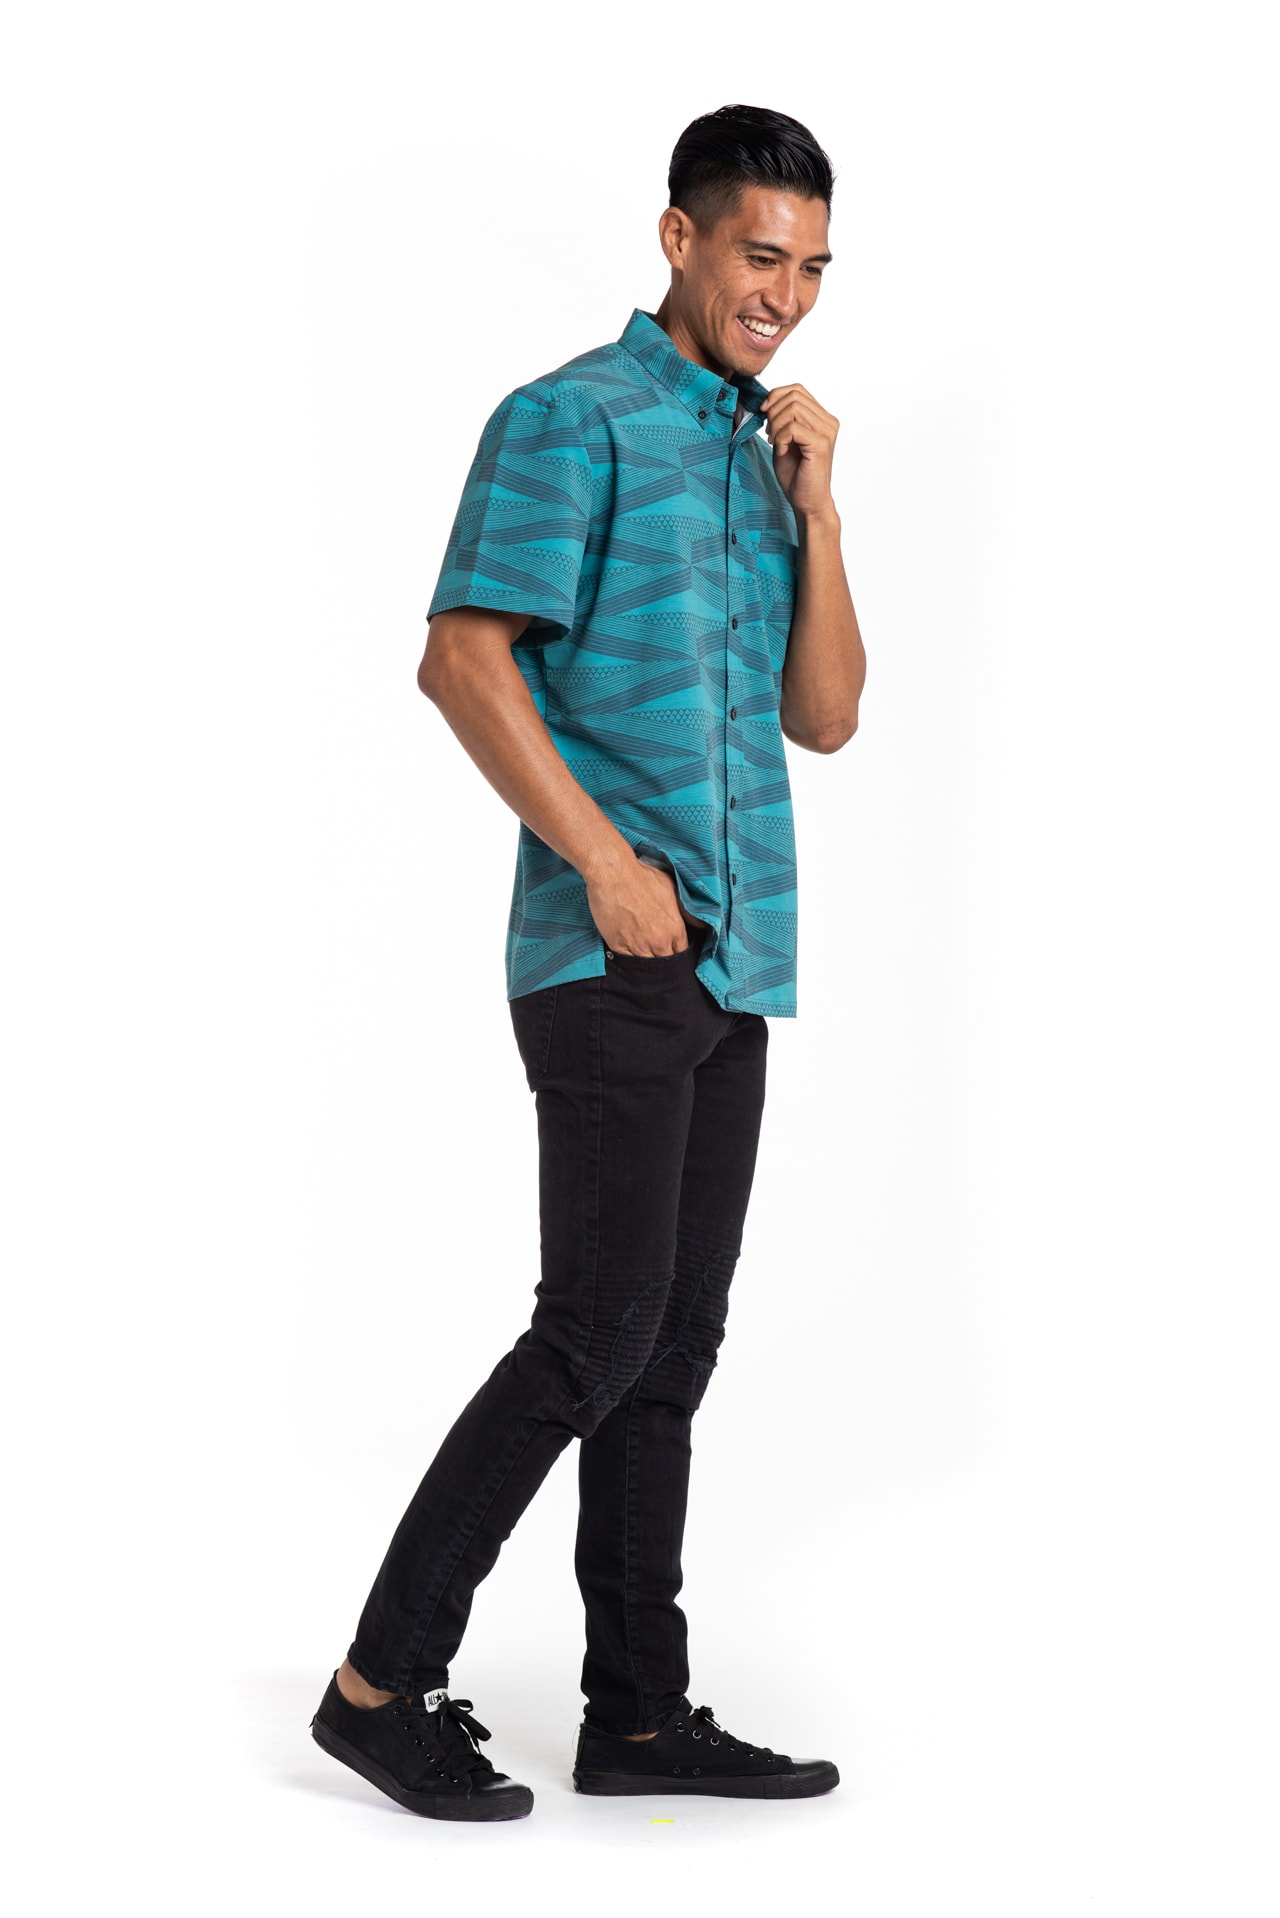 Male model wearing Mahalo Nui Shirt - Side View